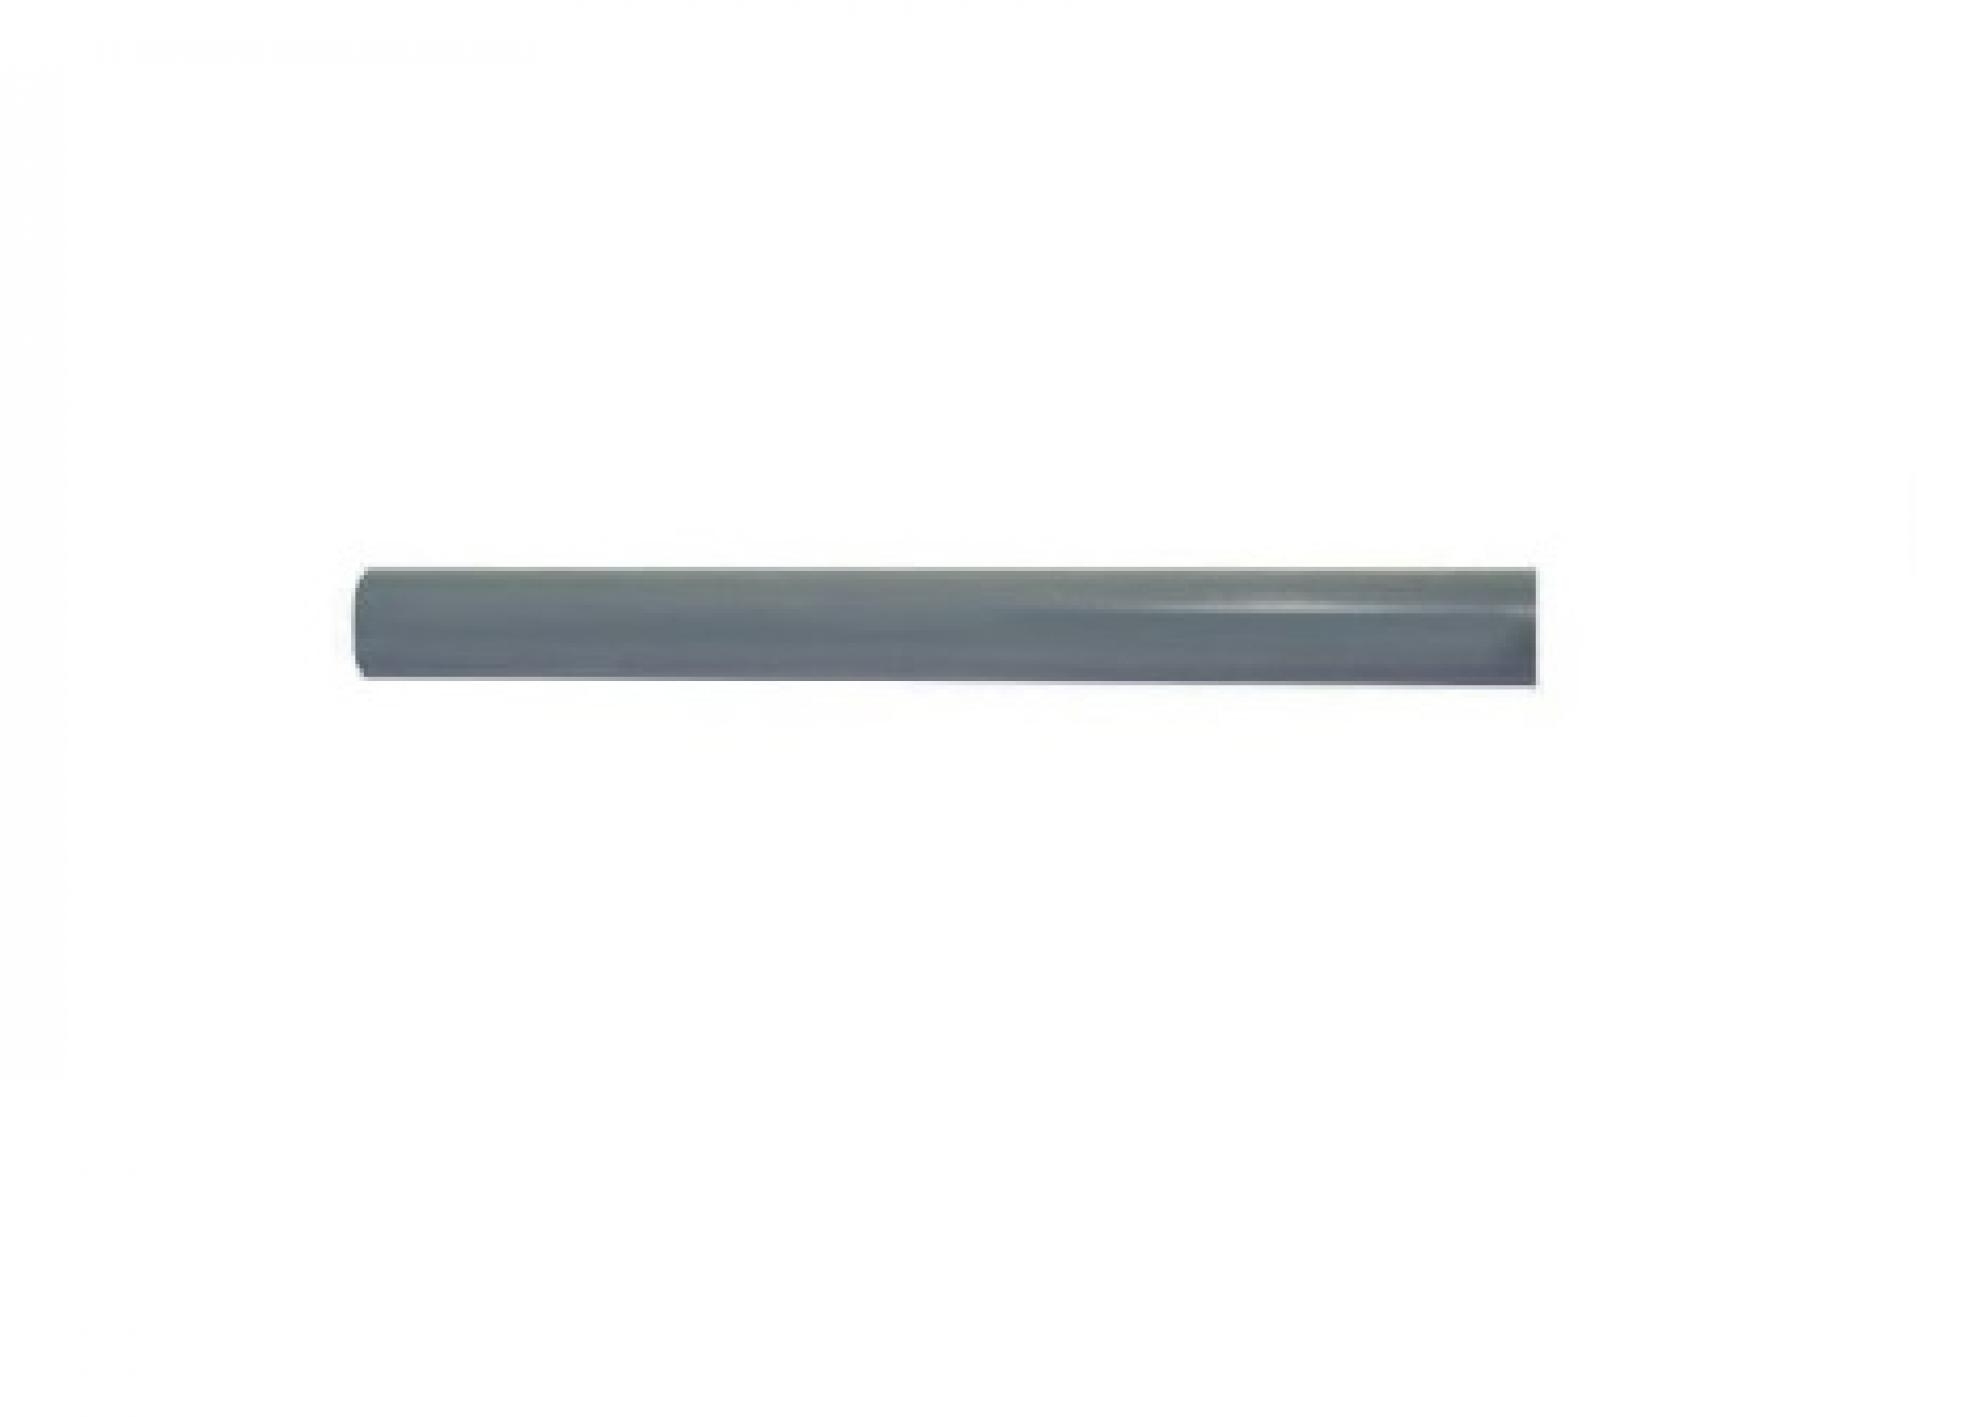 "Eletroduto PVC 3/4"" polegadas - Cinza"